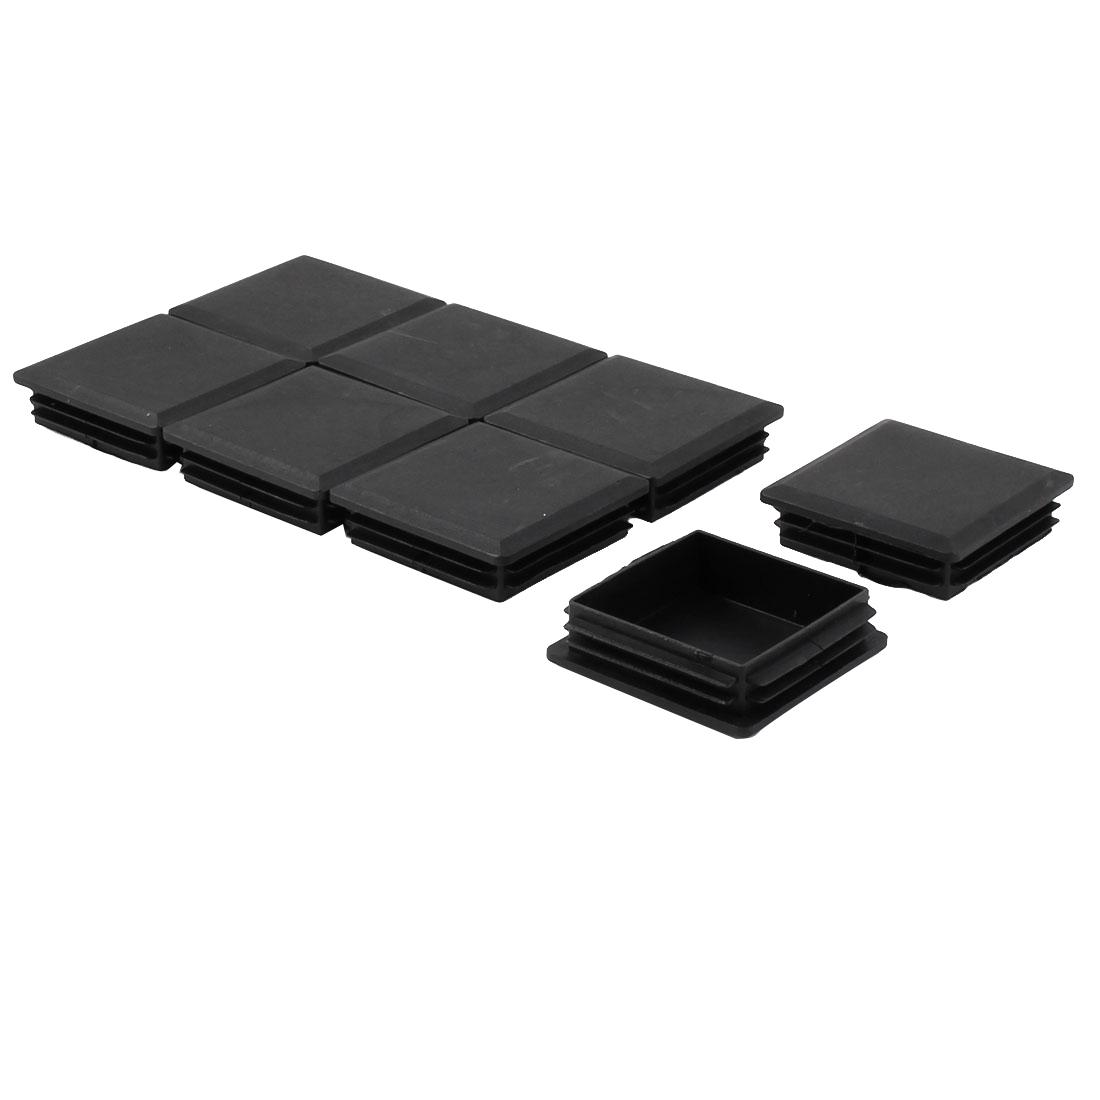 Furniture Table Chair Legs Plastic Square Pipe Tube Inserts Plugs Black 8pcs